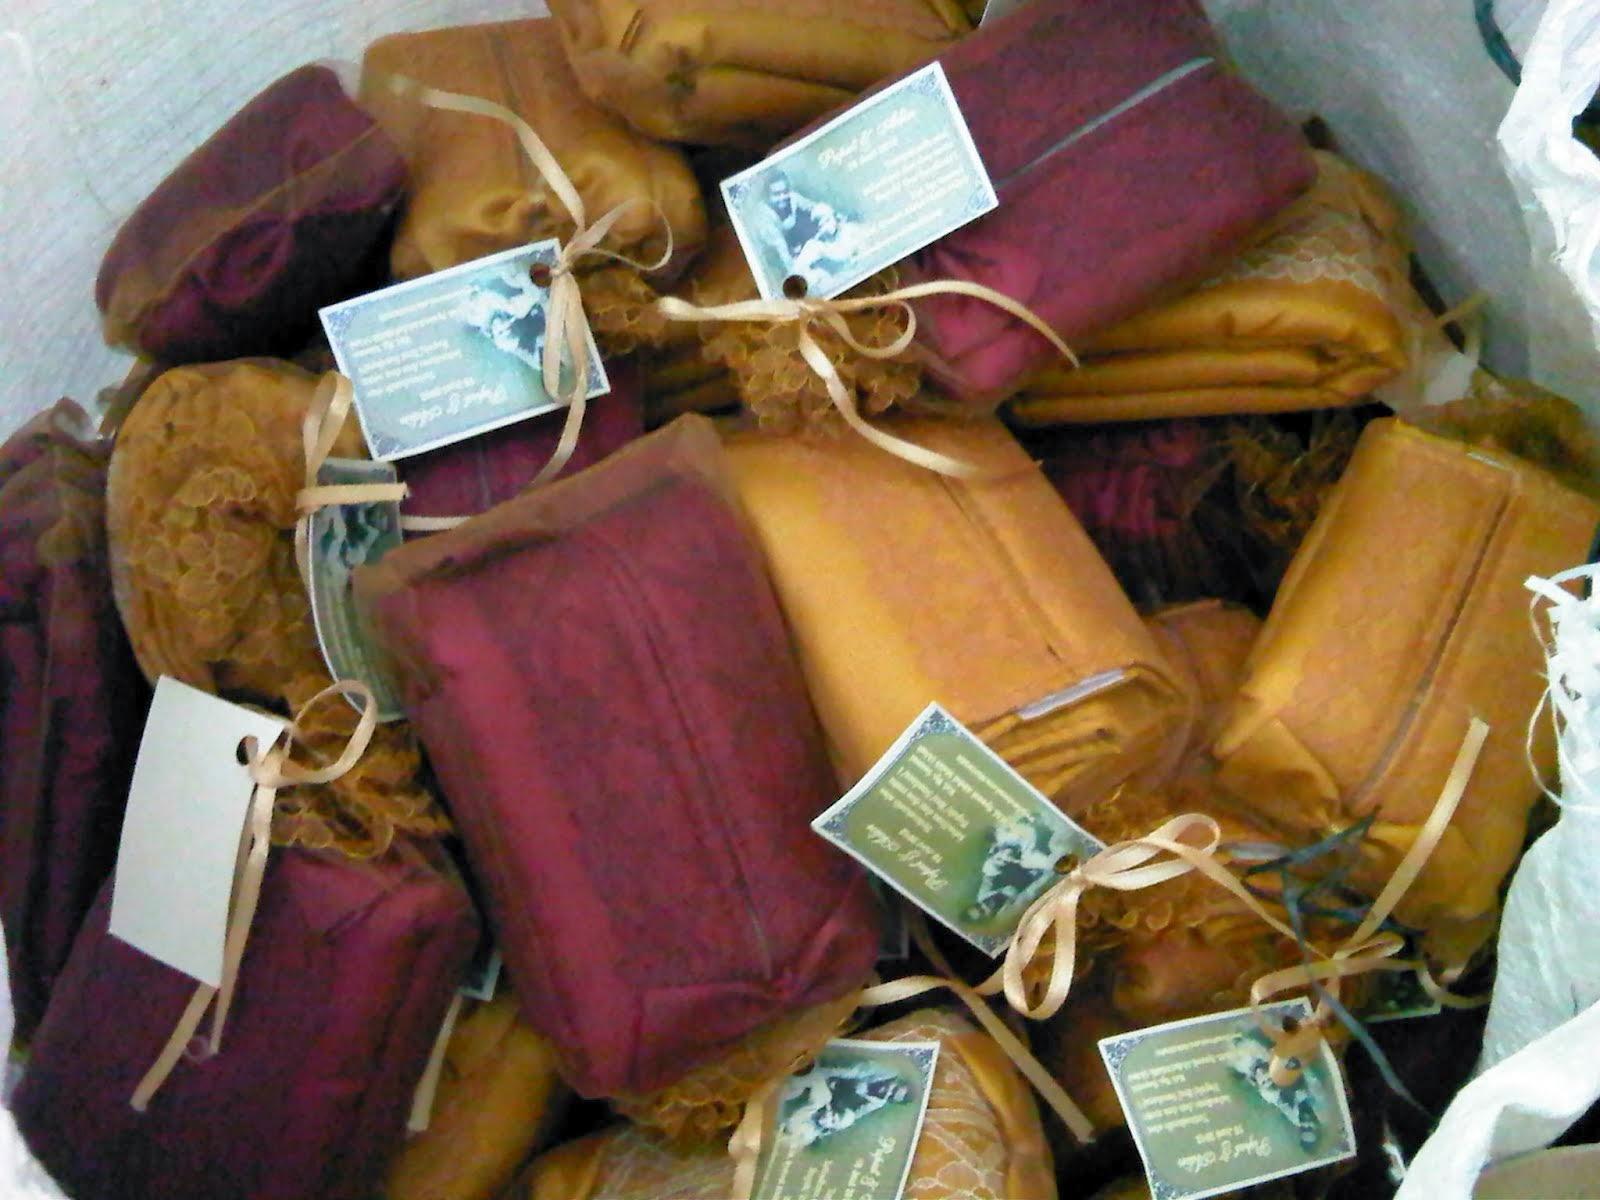 souvenir tempat tisu, souvenir tempat tisu murah, souvenir tempat tisu organdi,souvenir tempat tisu satin.